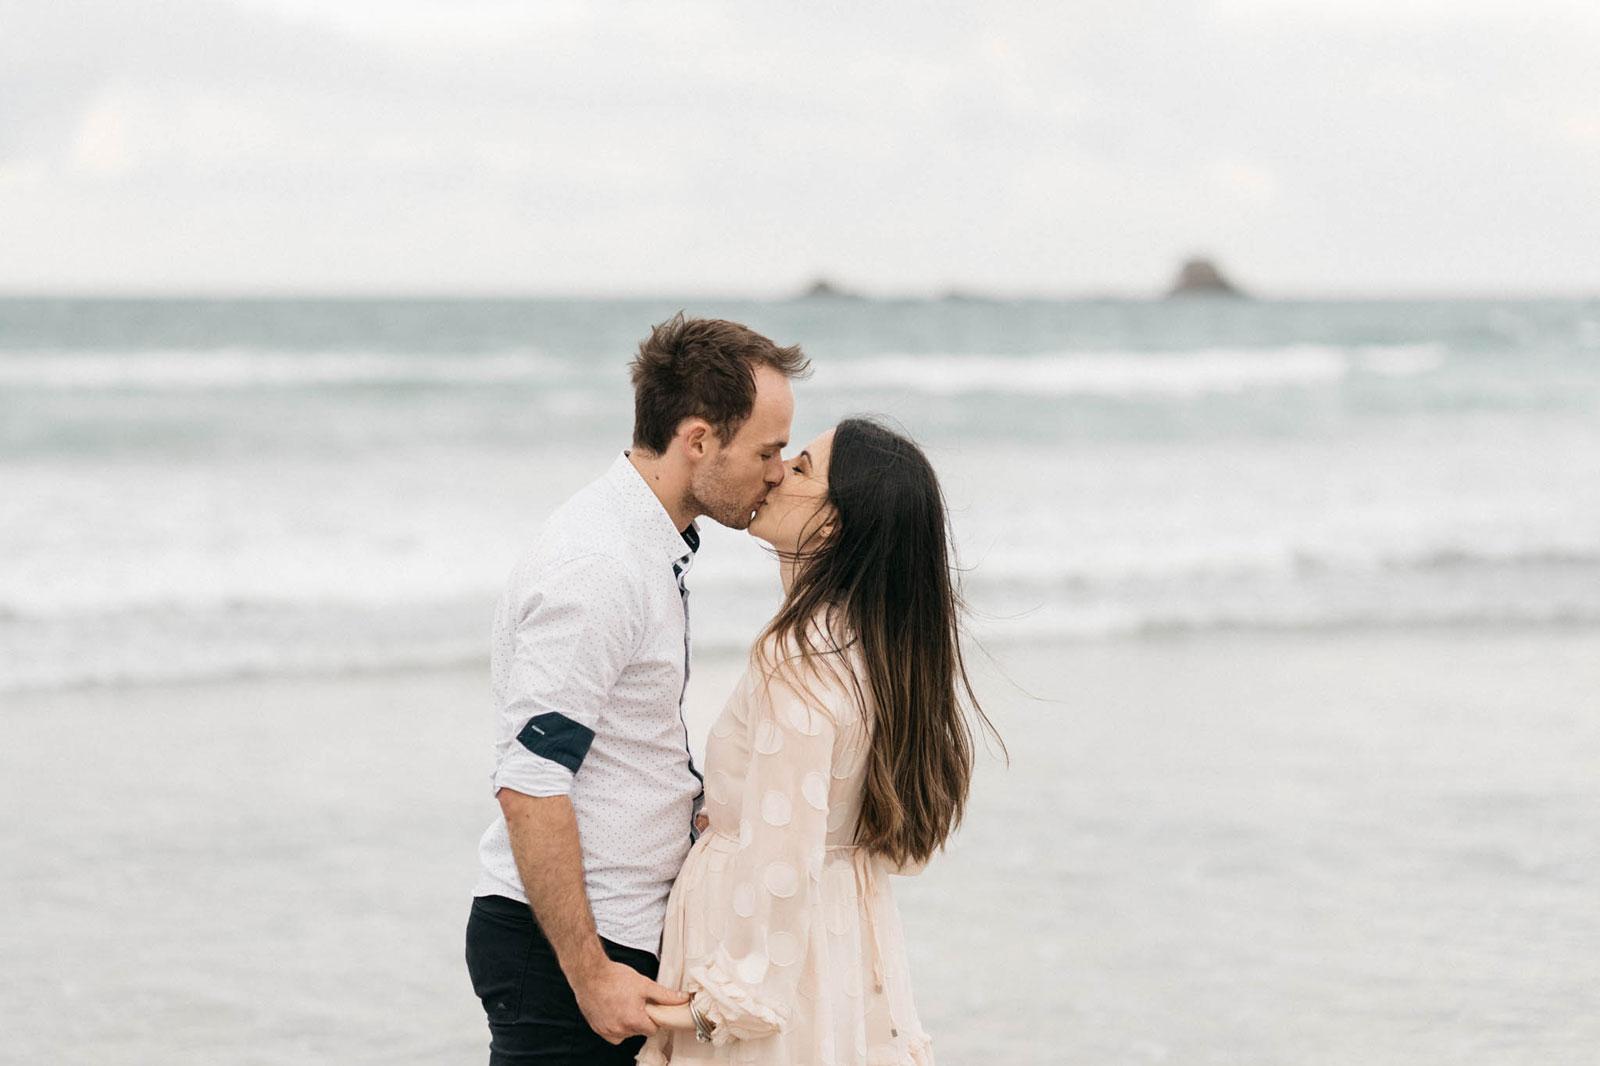 newfound-e-m-mt-maunganui-tauranga-wedding-photographer-030-a